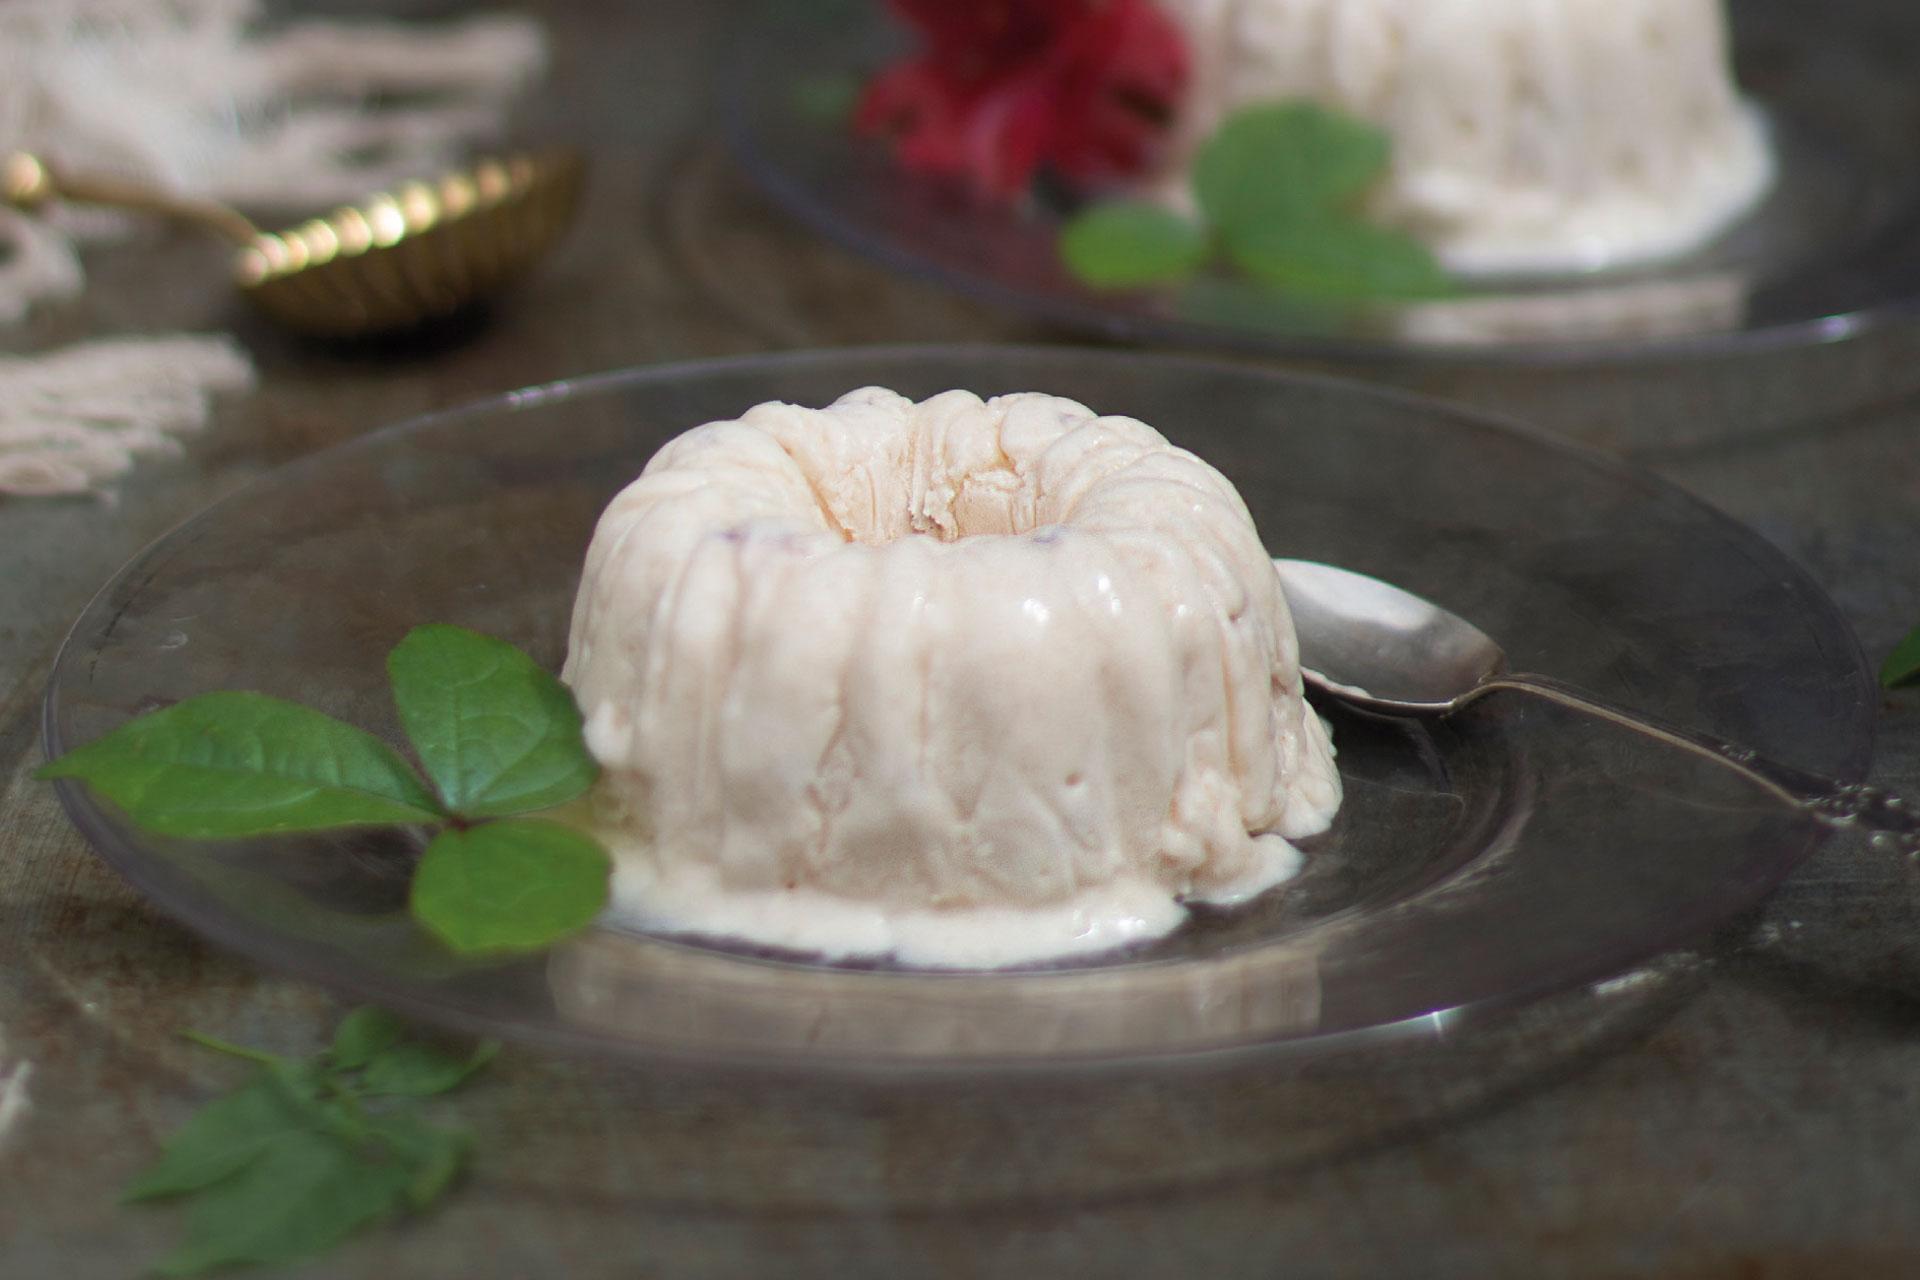 Receta de Semifreddo de nectarina blanca | Cocinas Santos | Santiago Interiores